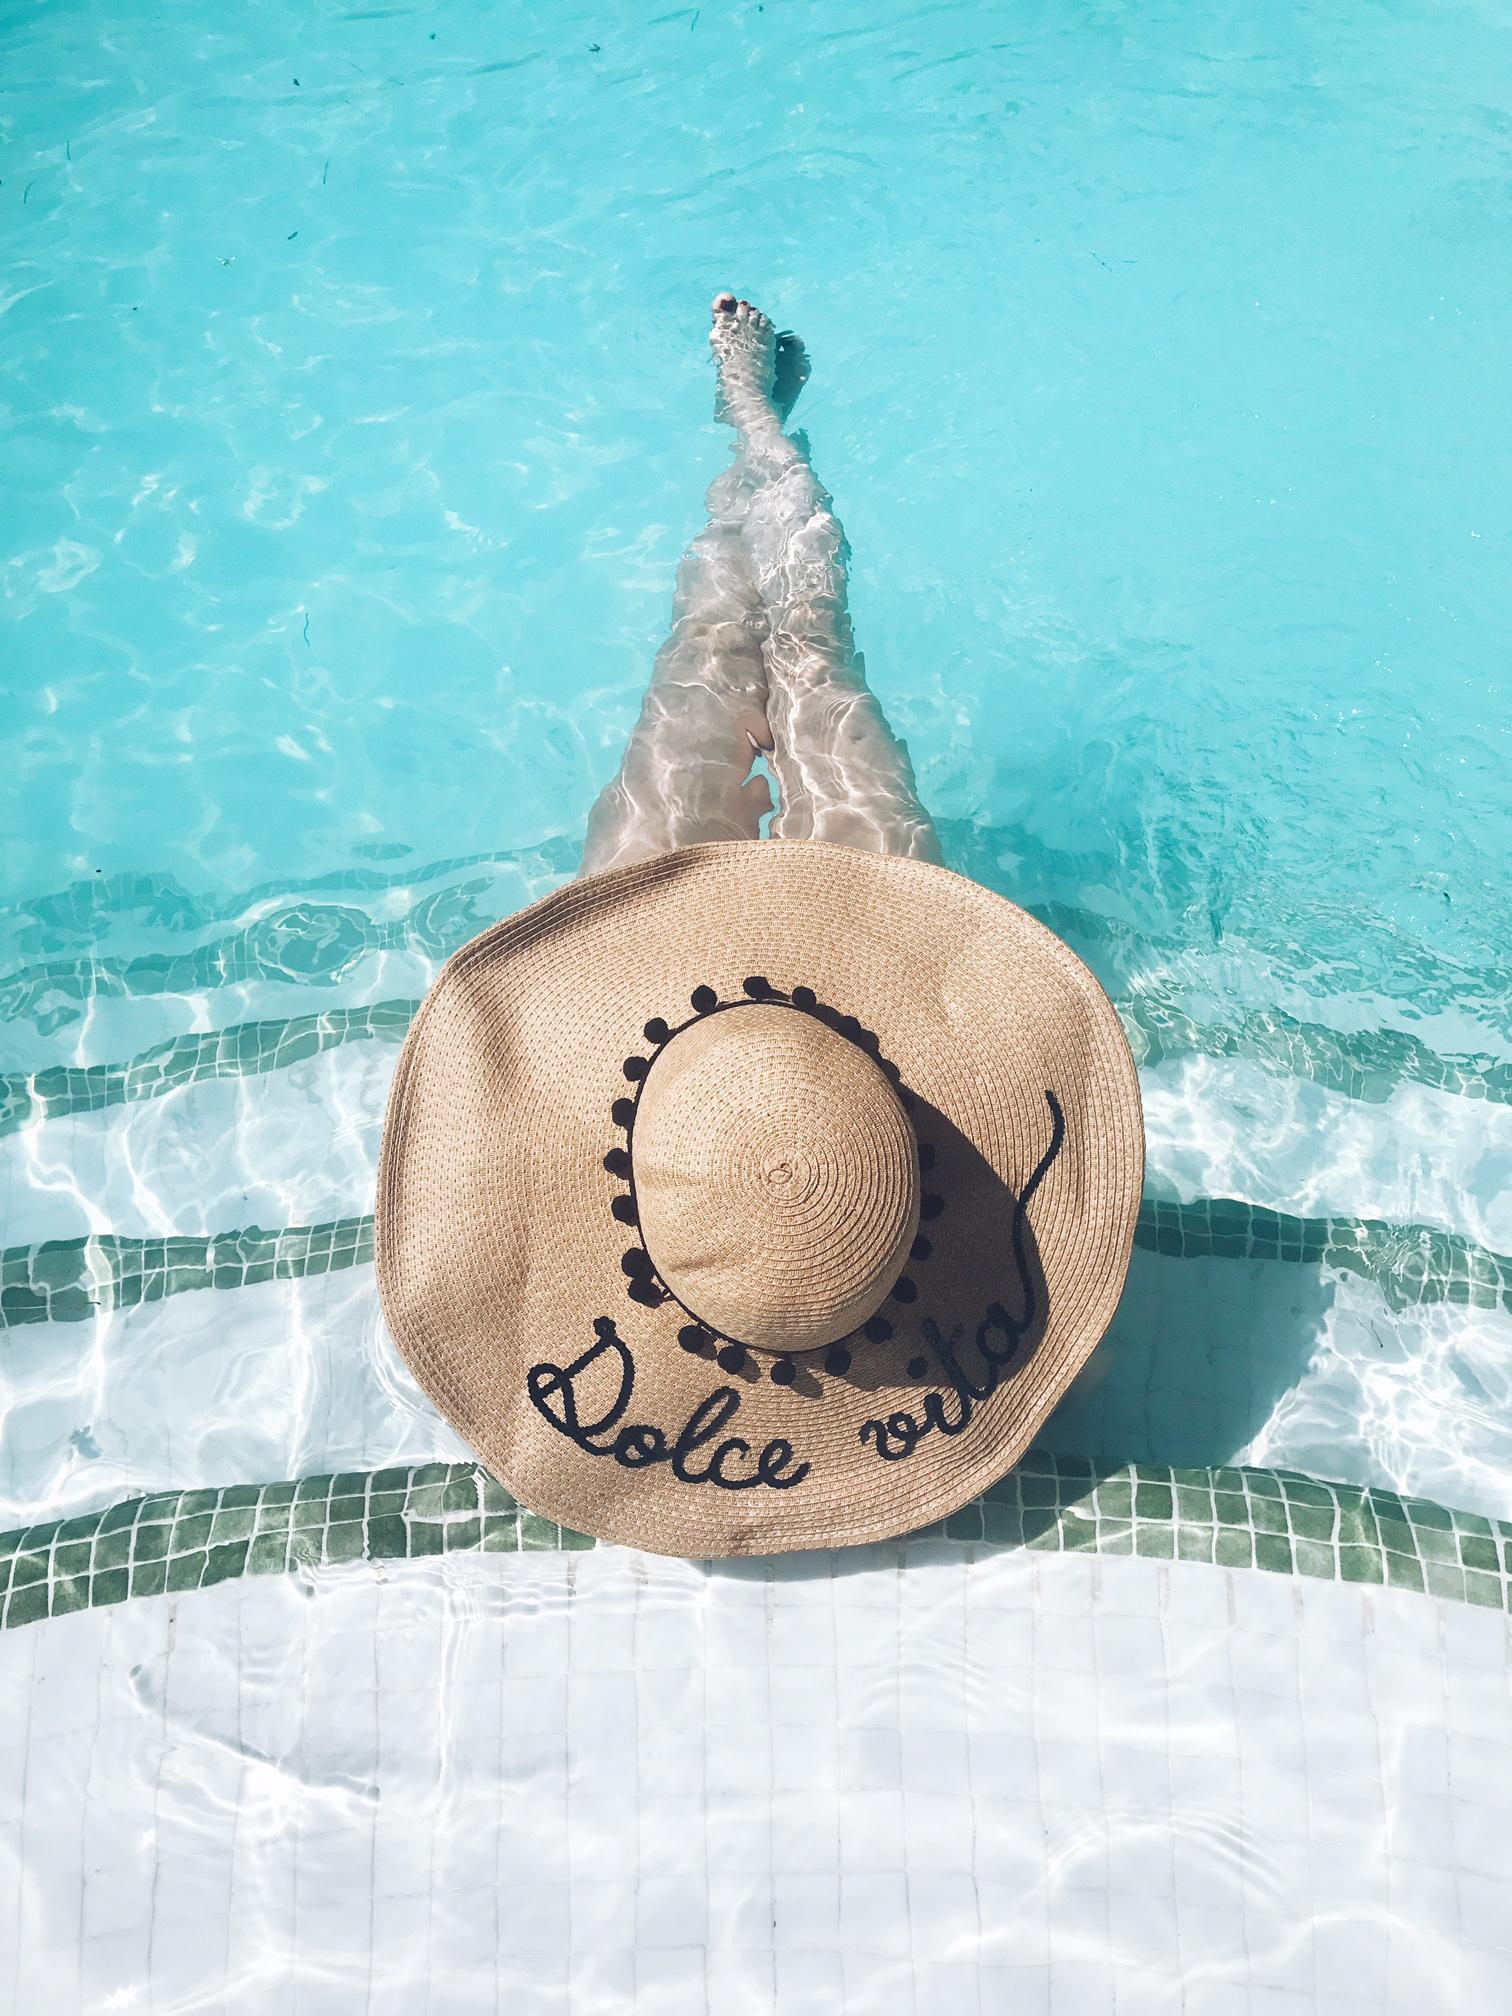 Stress free luxury holidays